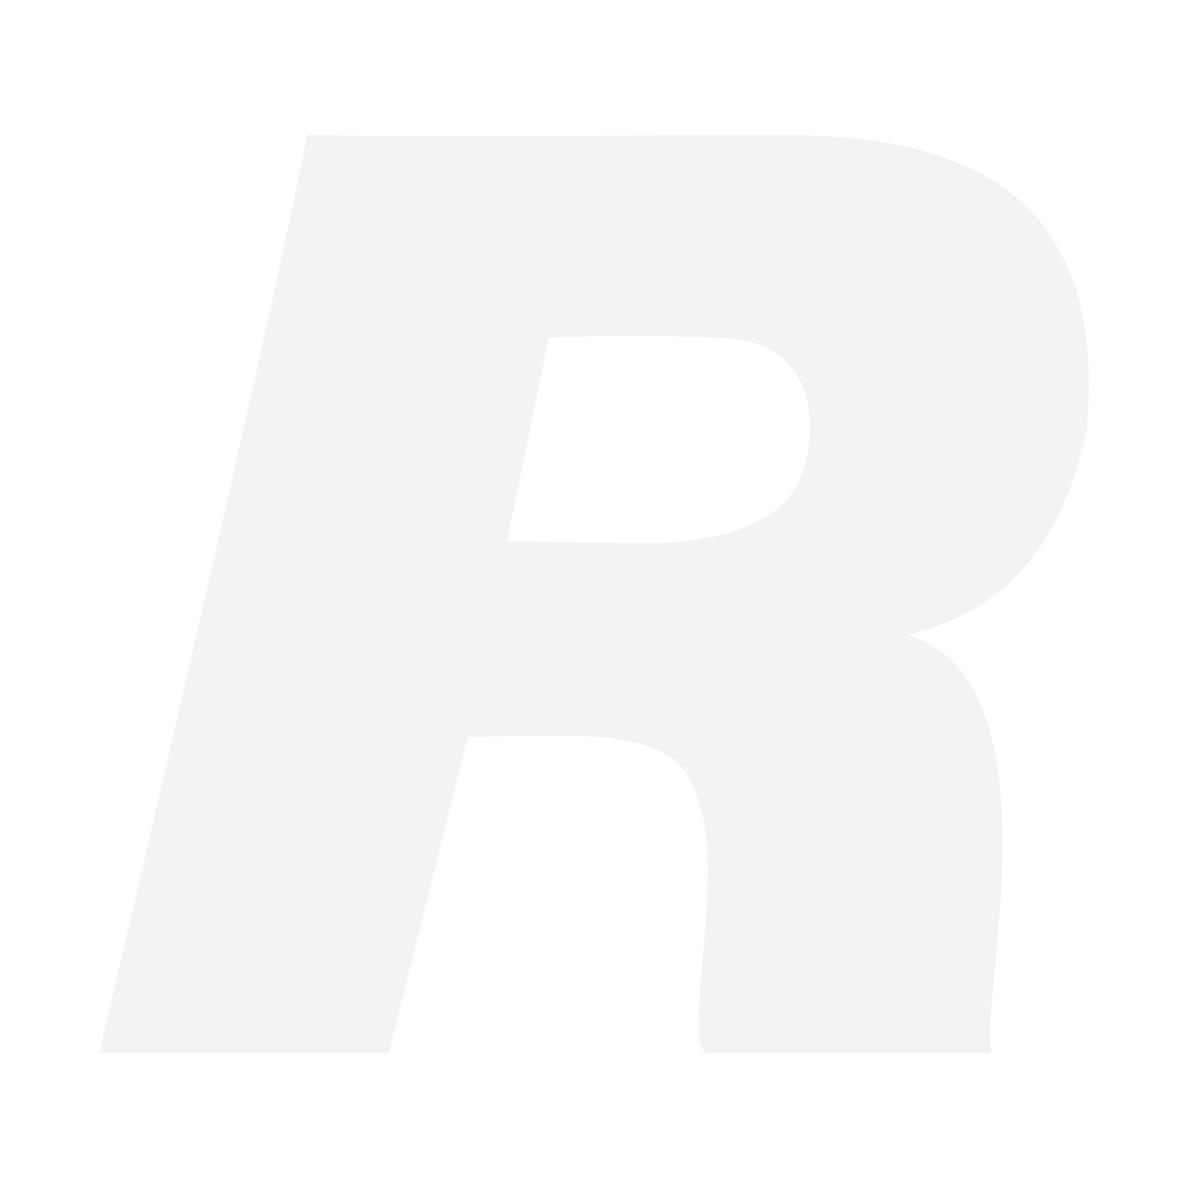 GoPro Hero 5 Black + Lowepro Dashpoint AVC 60 II